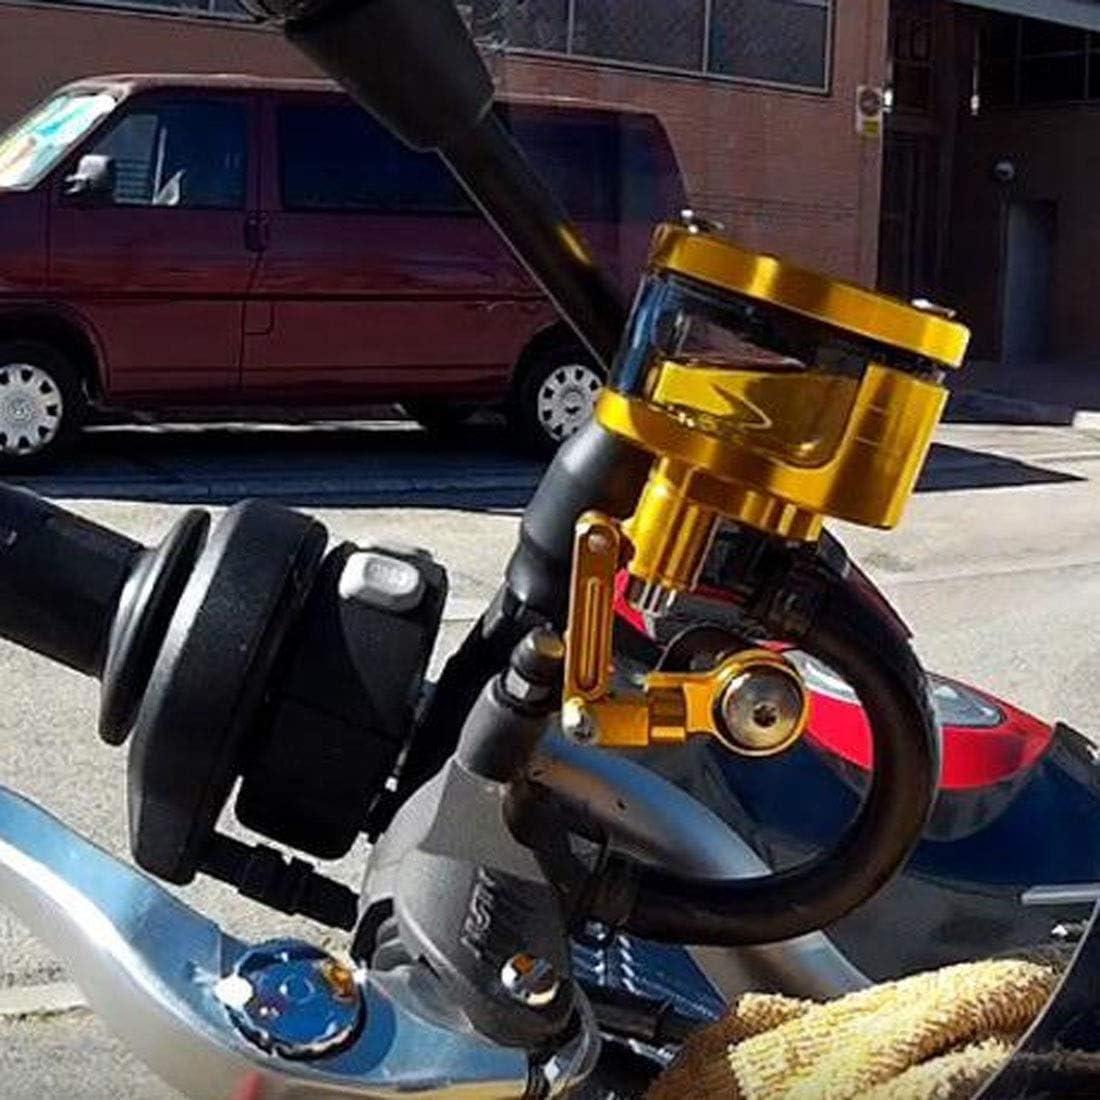 Lefossi Yellow Universal Motorcycle Foot Rear Brake Master Cylinder Tank Oil Cup Fluid Bottle Reservoir